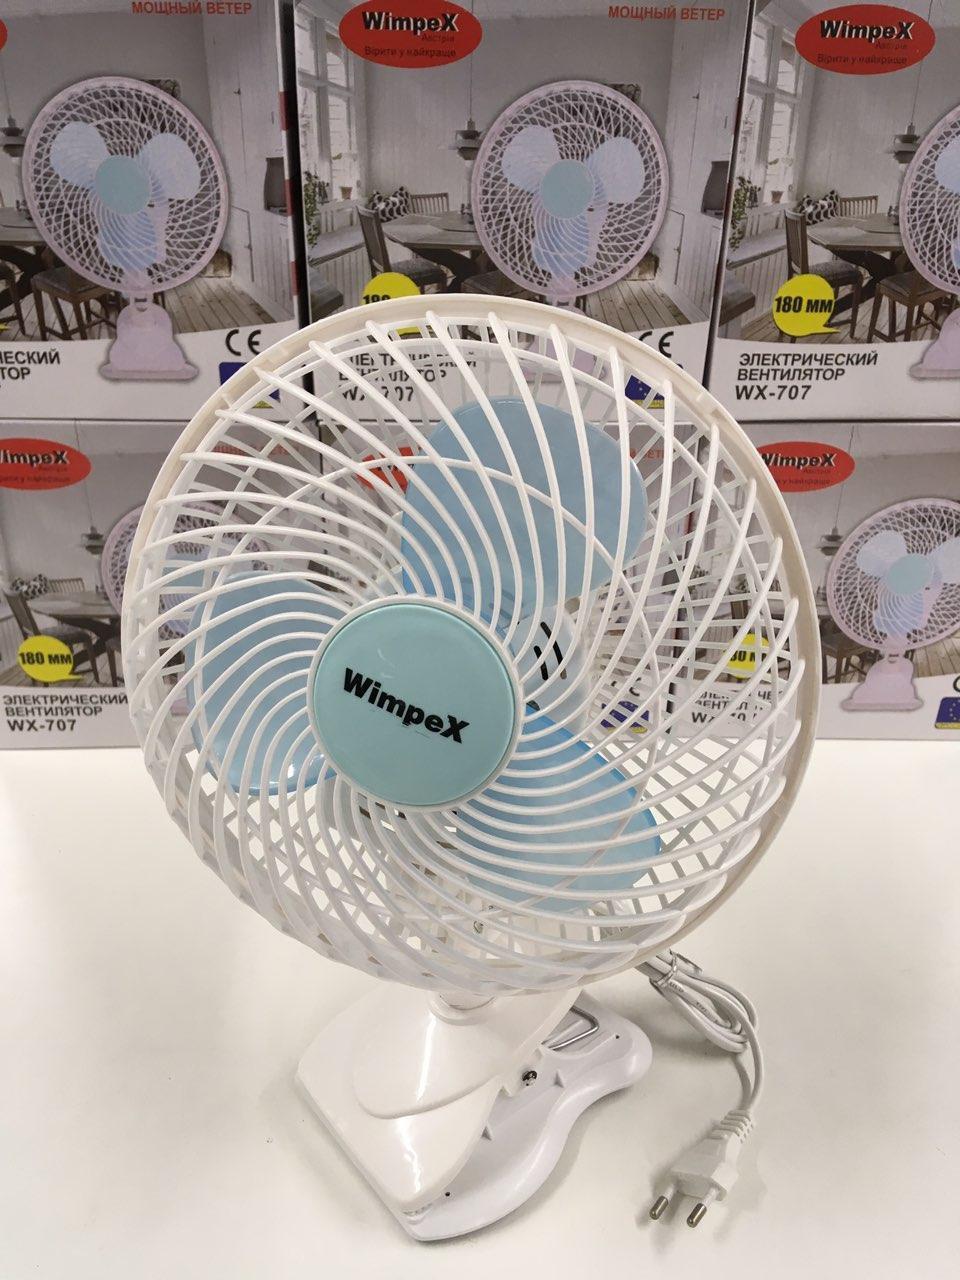 Вентилятор Wimpex WX-707 на прищепке МОЩНОСТЬ 50W